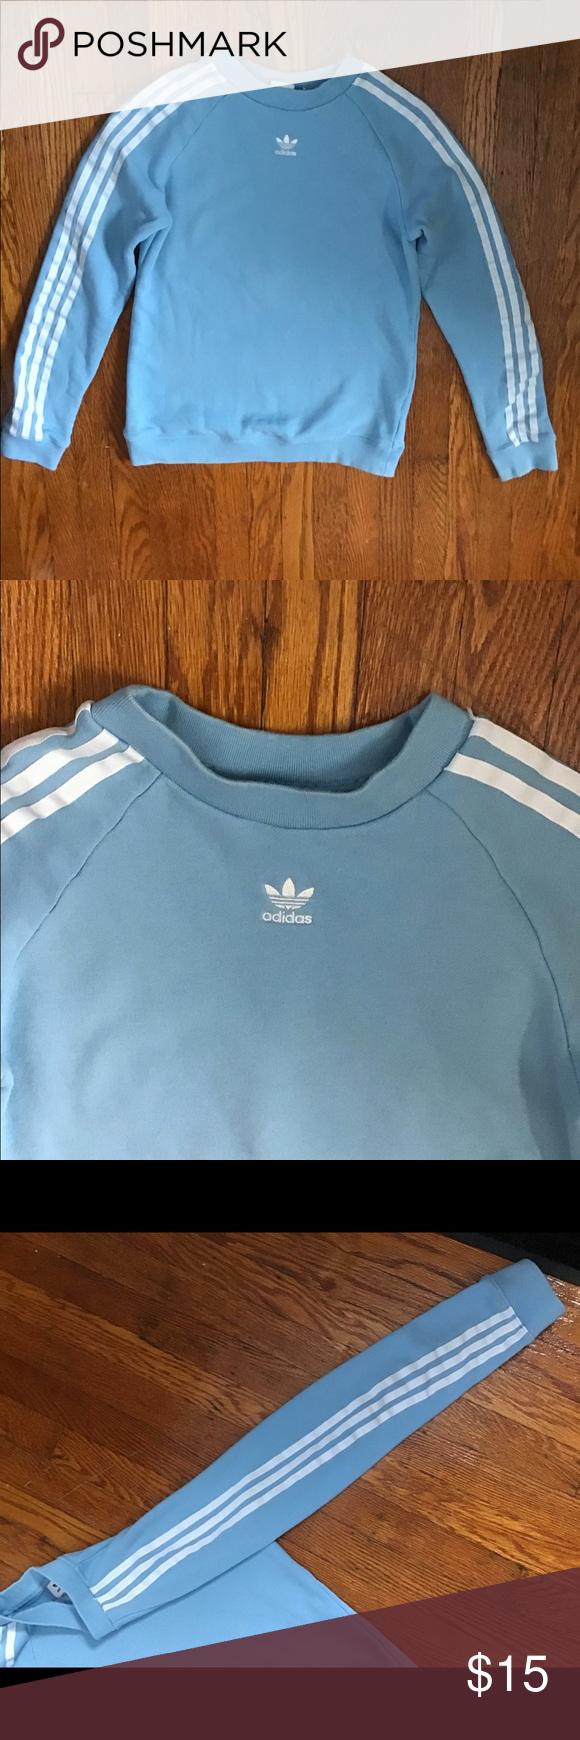 Light Blue Adidas Sweatshirt Sweatshirts Adidas Sweatshirt Blue Adidas [ 1740 x 580 Pixel ]